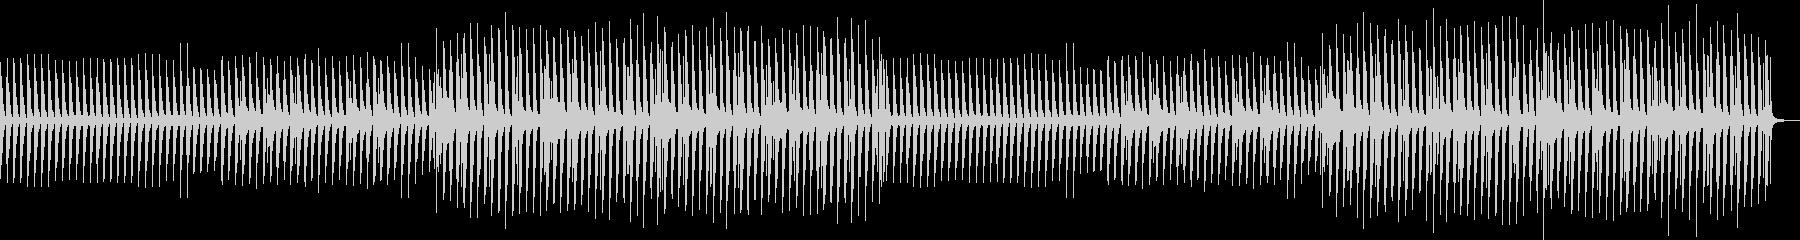 Background Piano Popの未再生の波形